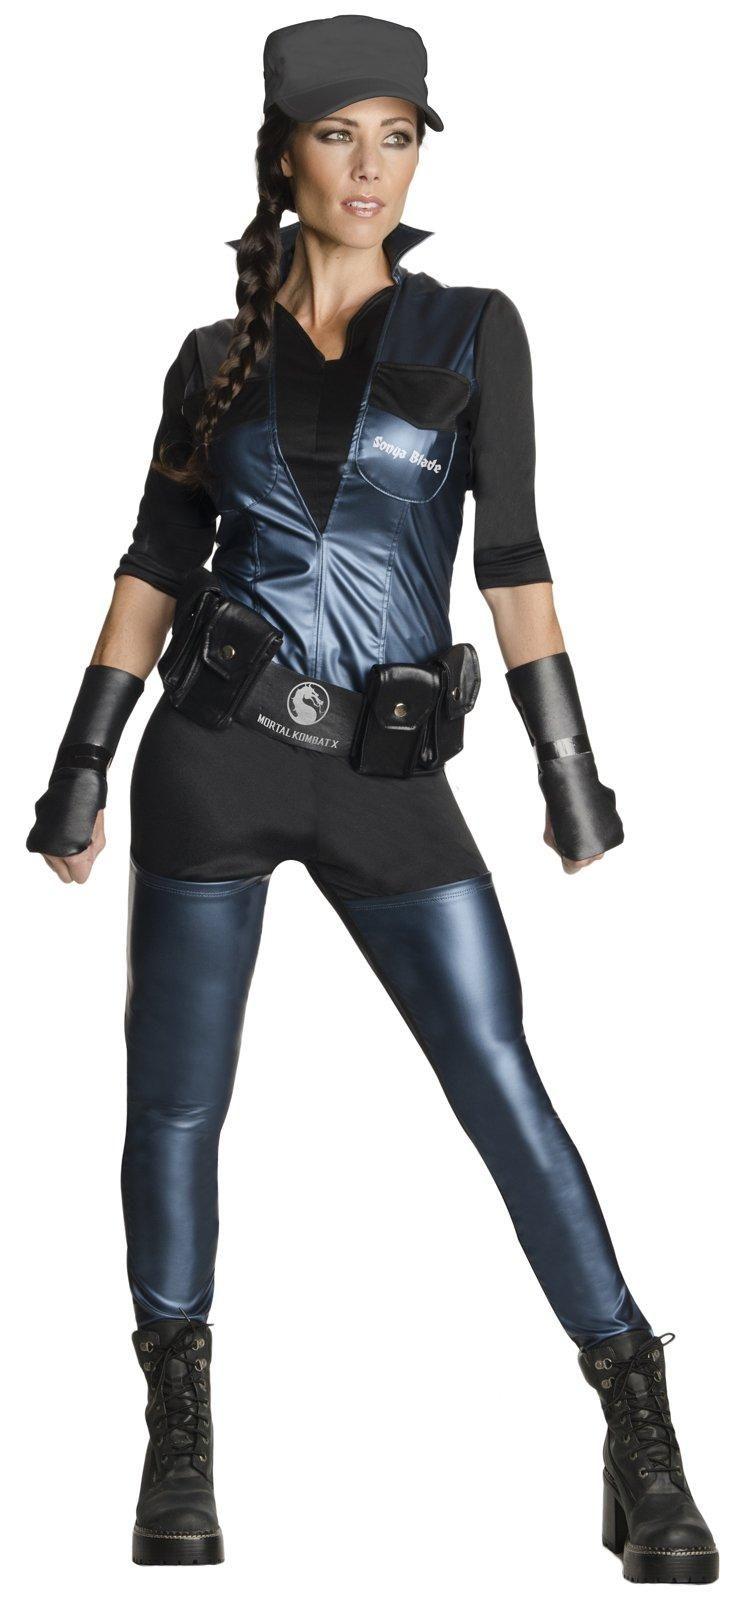 Mortal Kombat: Womens Sonya Blade Costume from Buycostumes.com